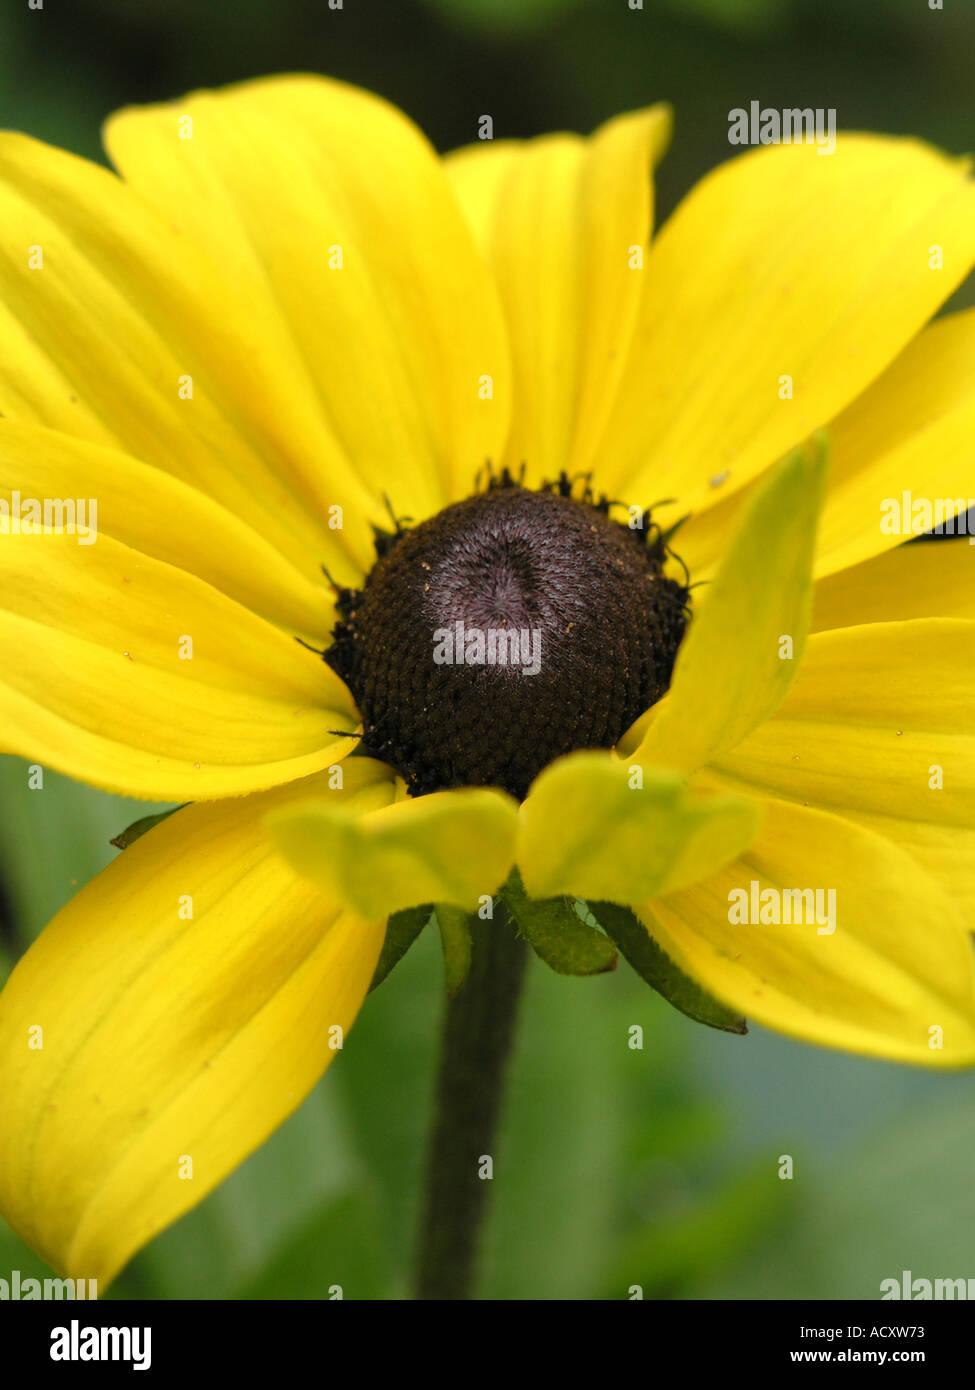 Yellow flower black centre black eyed susan latin namerudbeckia yellow flower black centre black eyed susan latin namerudbeckia mightylinksfo